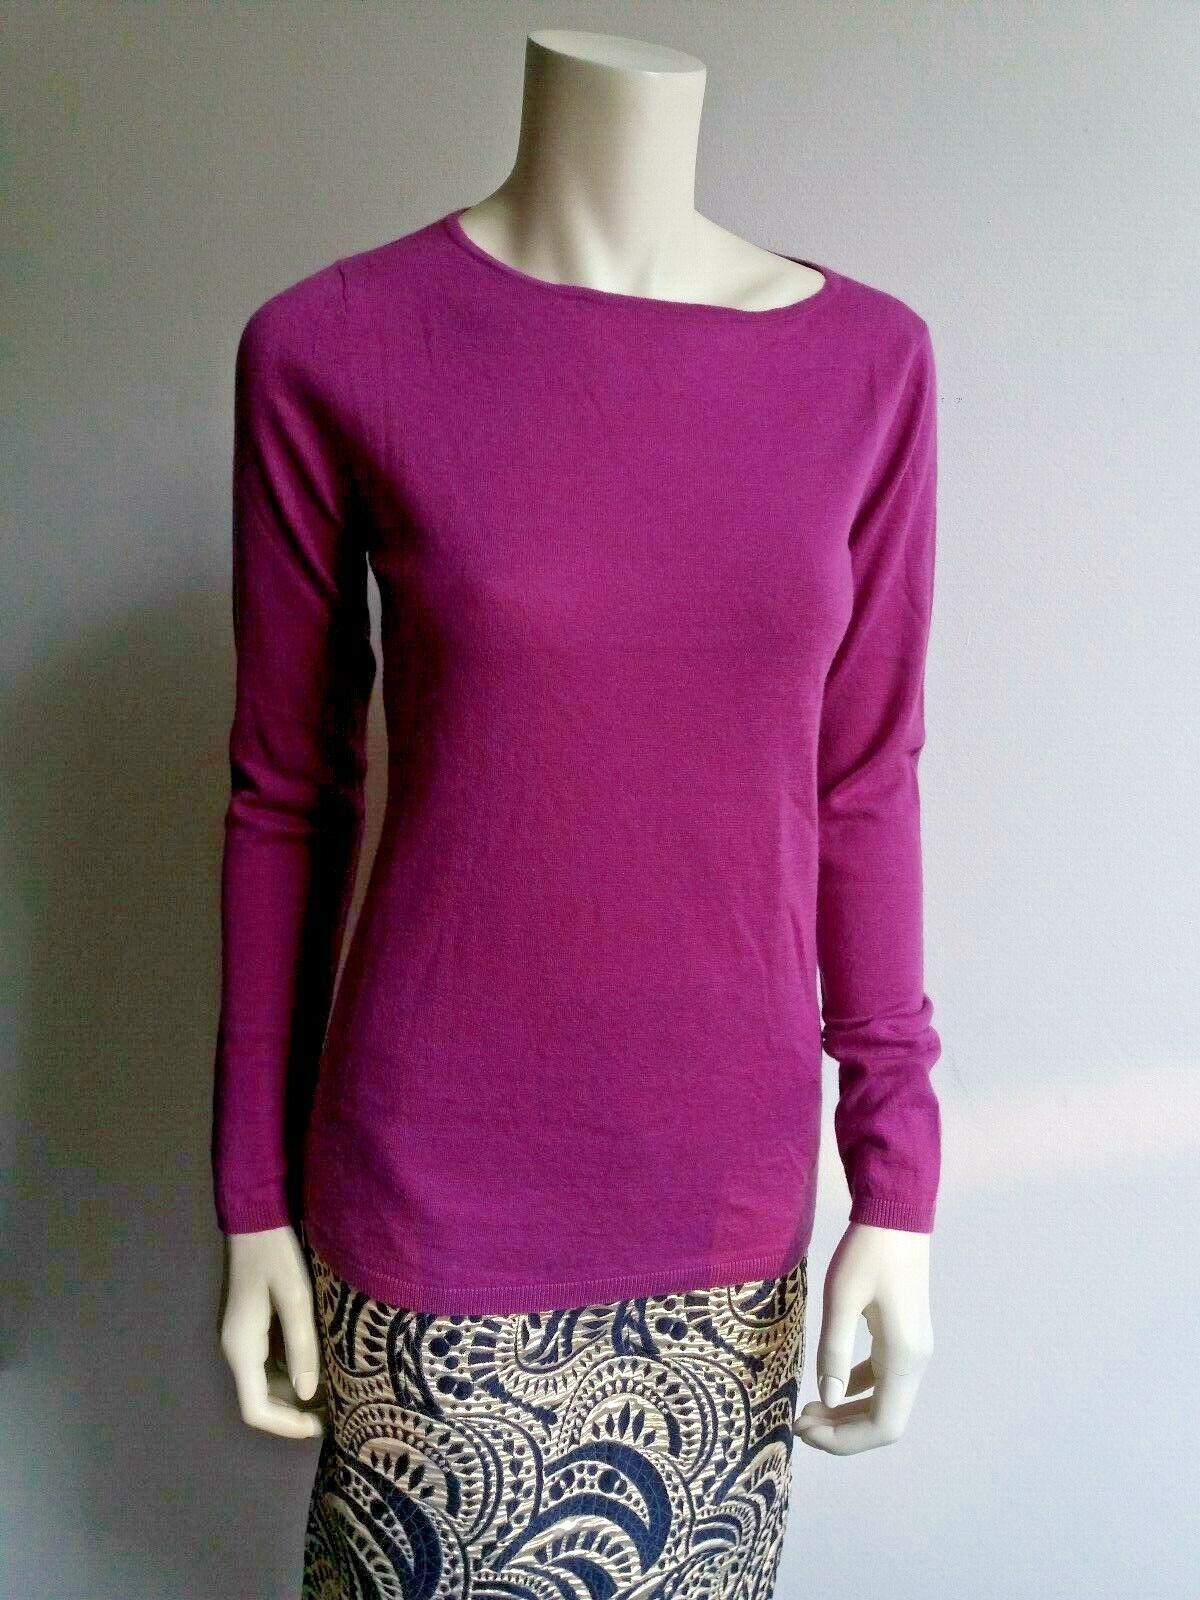 NewMAX MARA Pink Soft 100% CASHMERE Sweater, Sweater, Sweater, size L ea7234